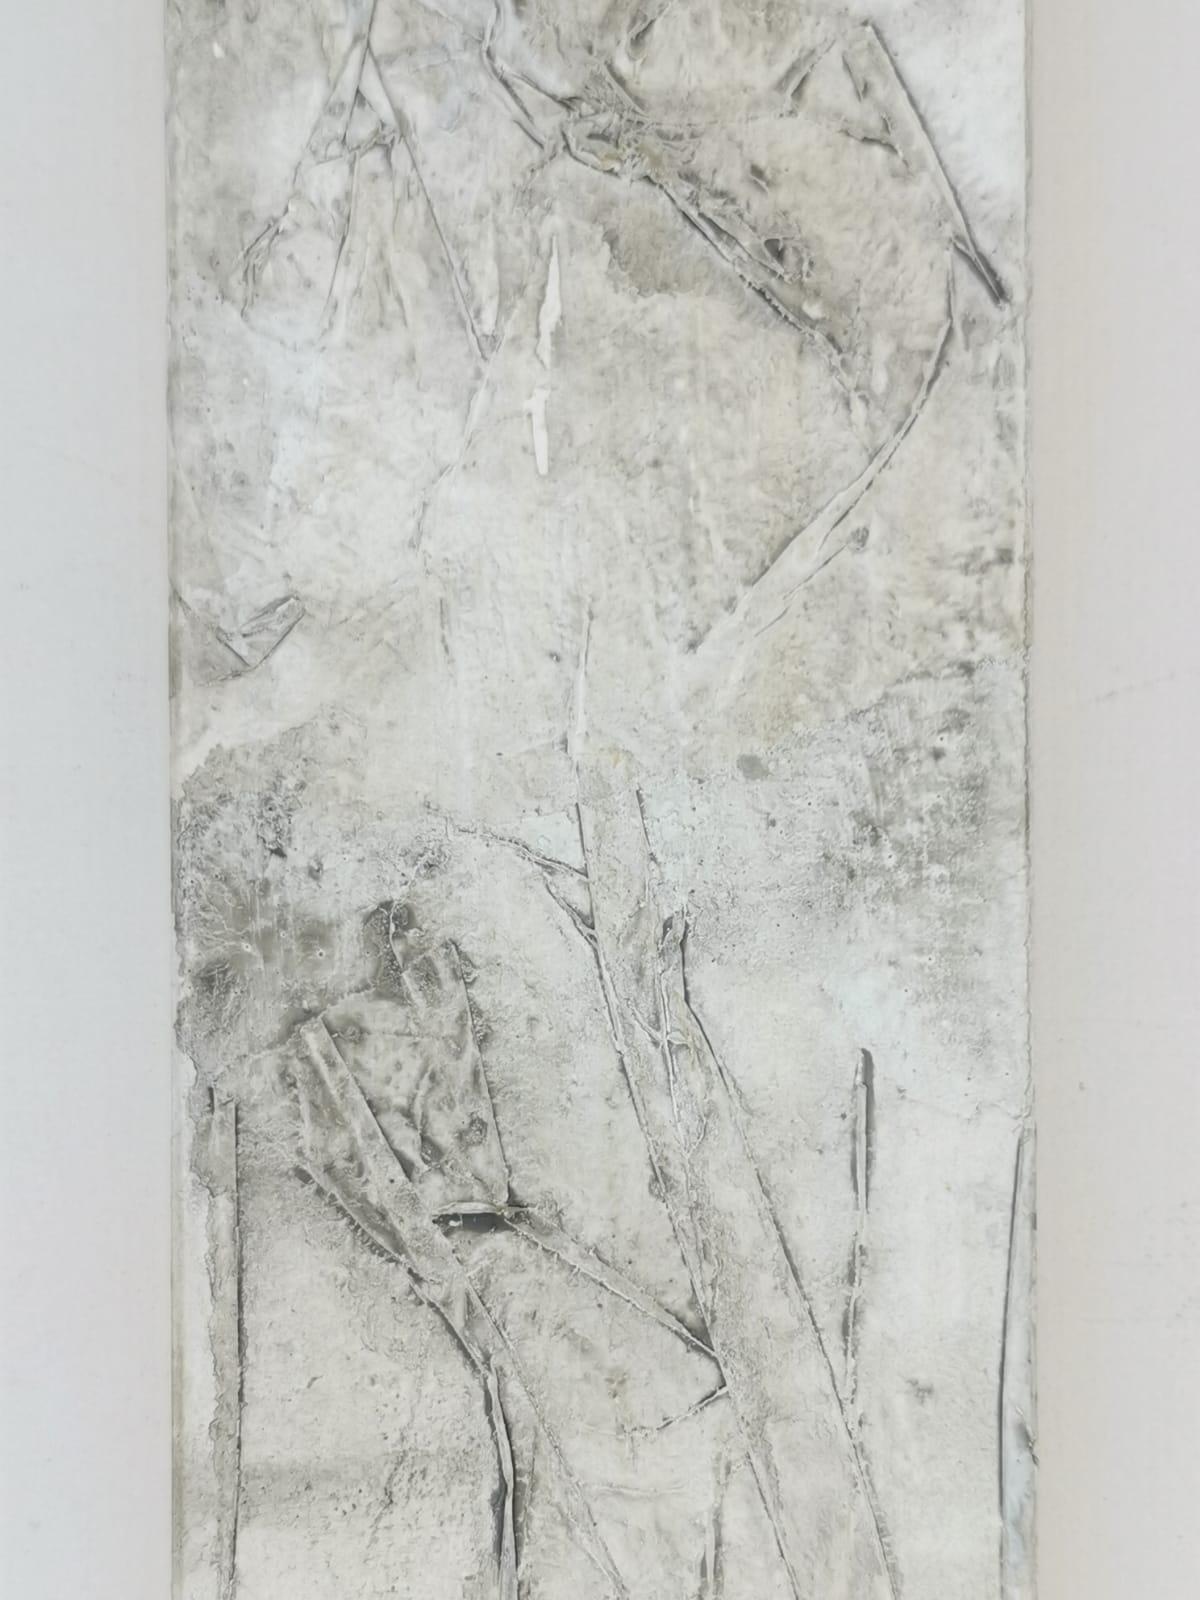 609-1903